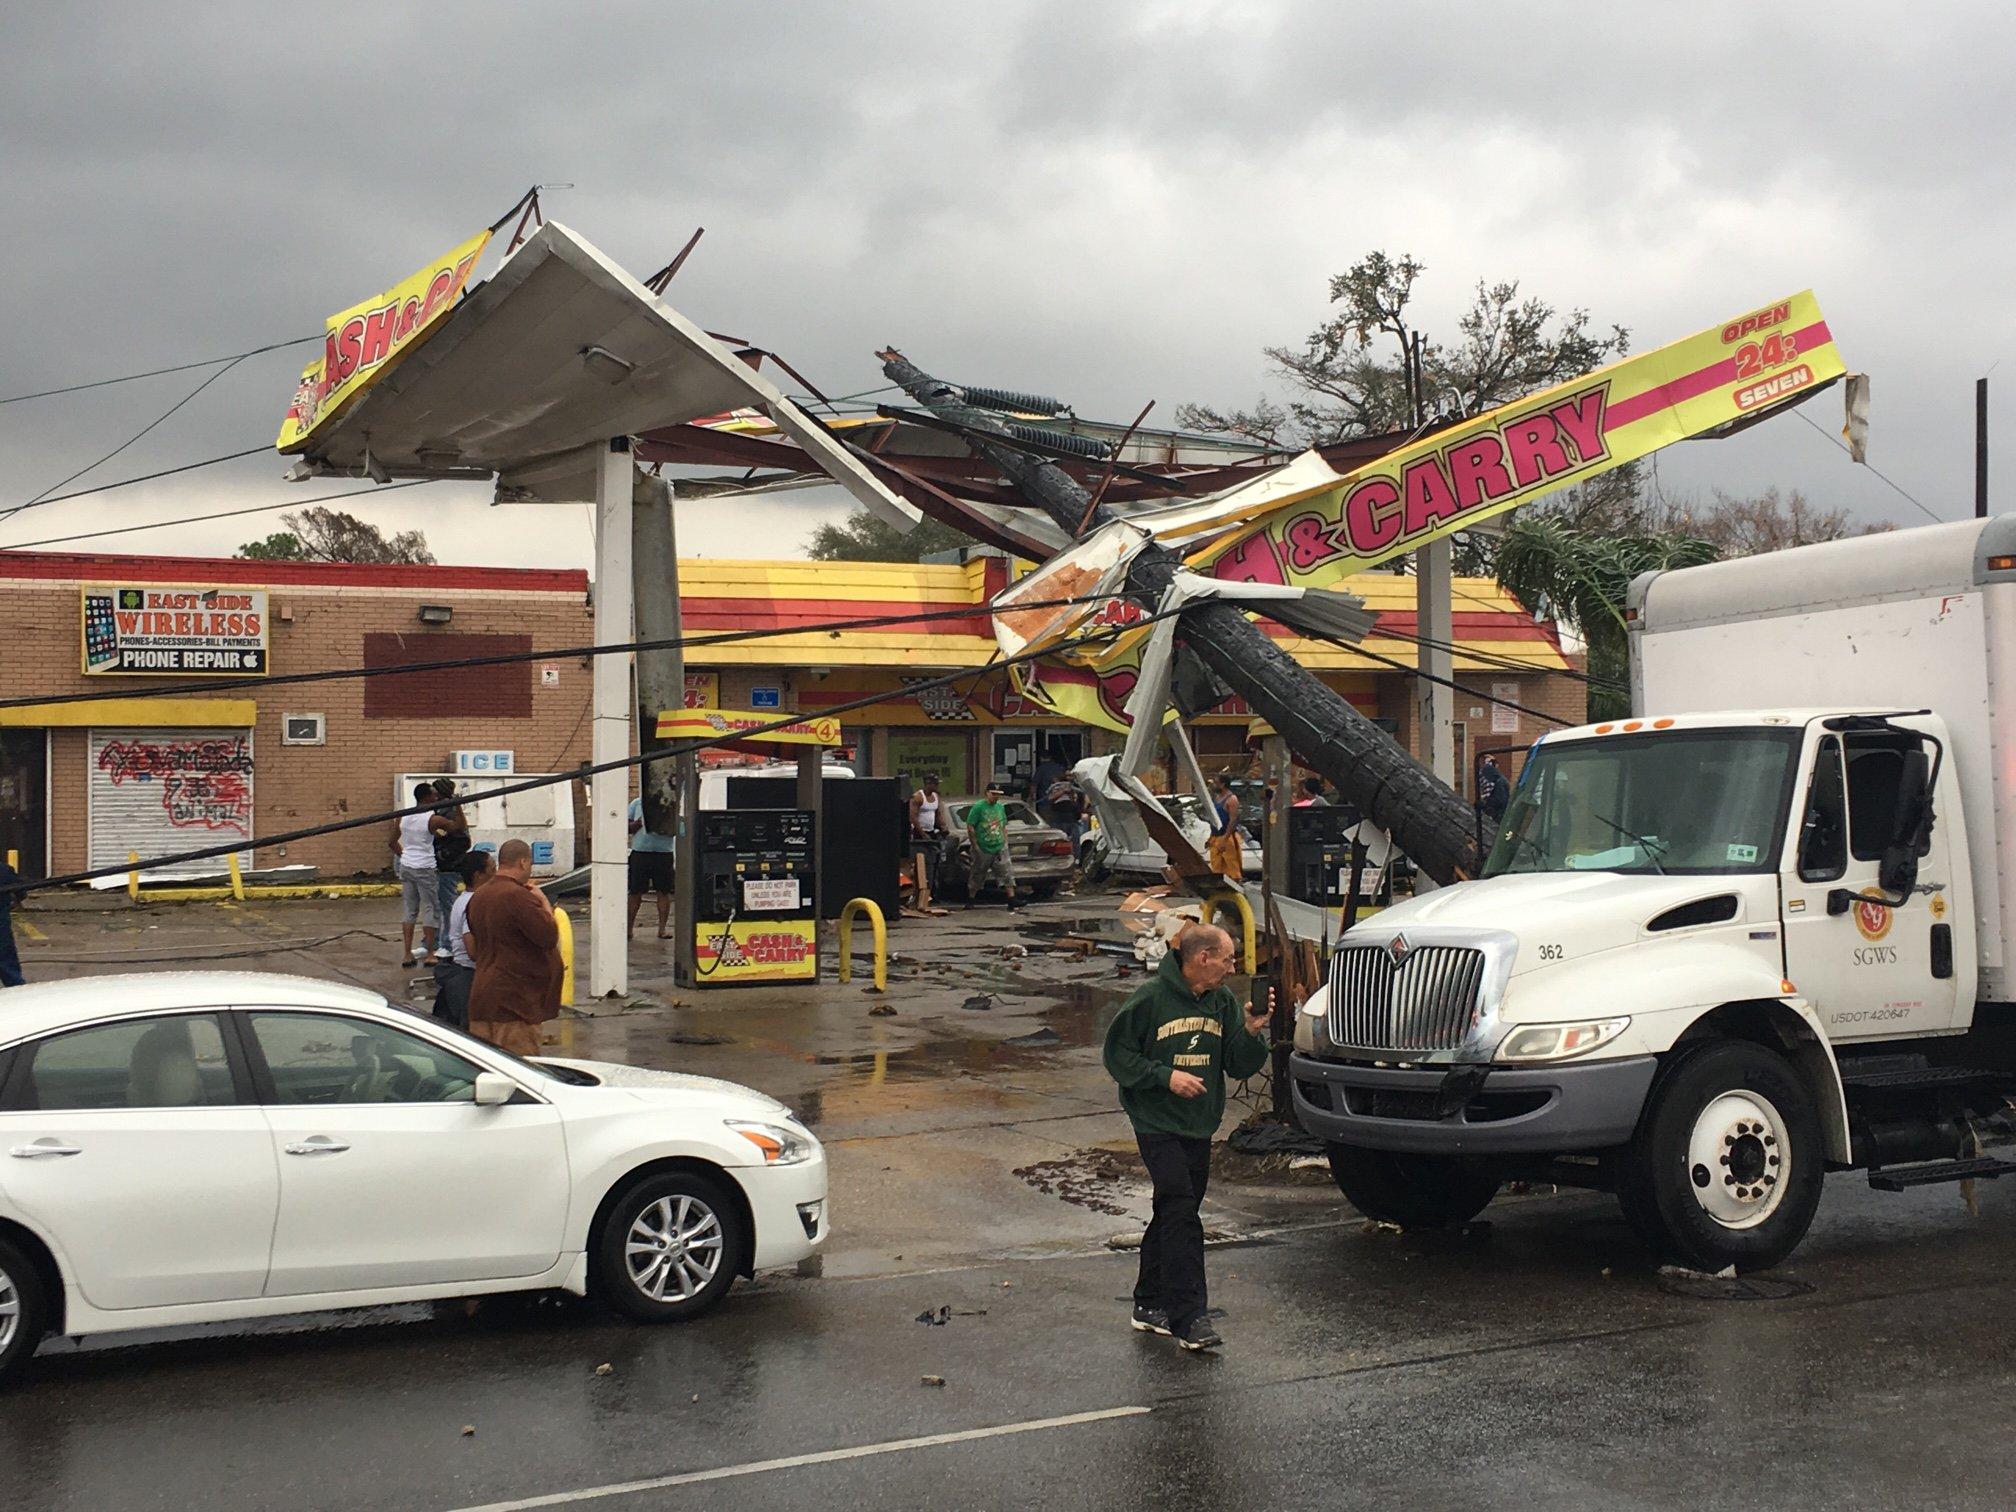 Thumbnail for Tornado strikes New Orleans area